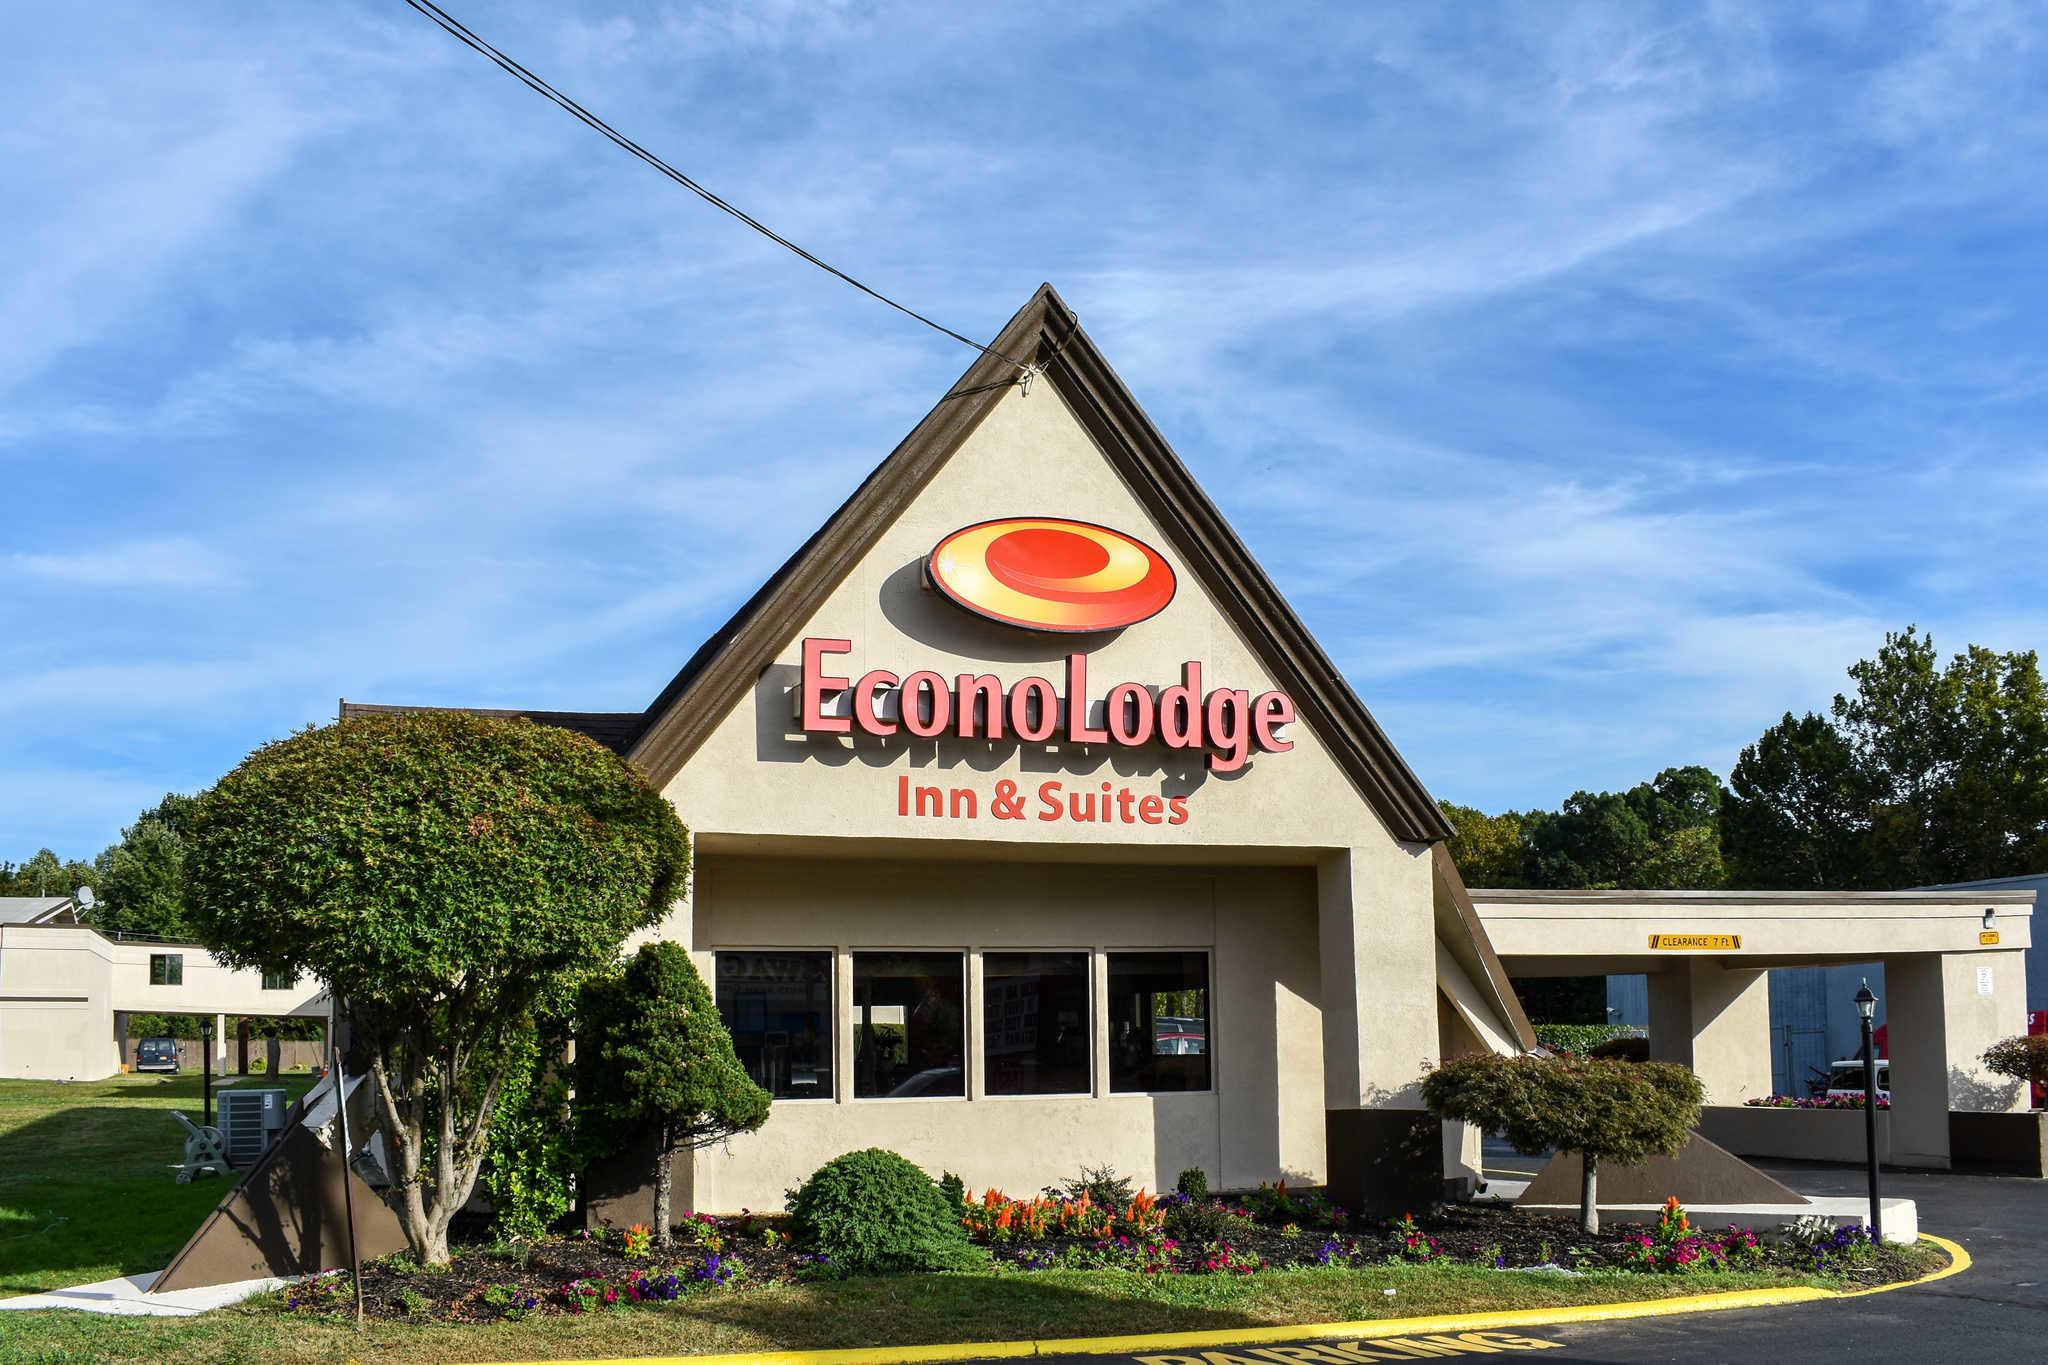 Econo Lodge Inn & Suites - Closed image 2